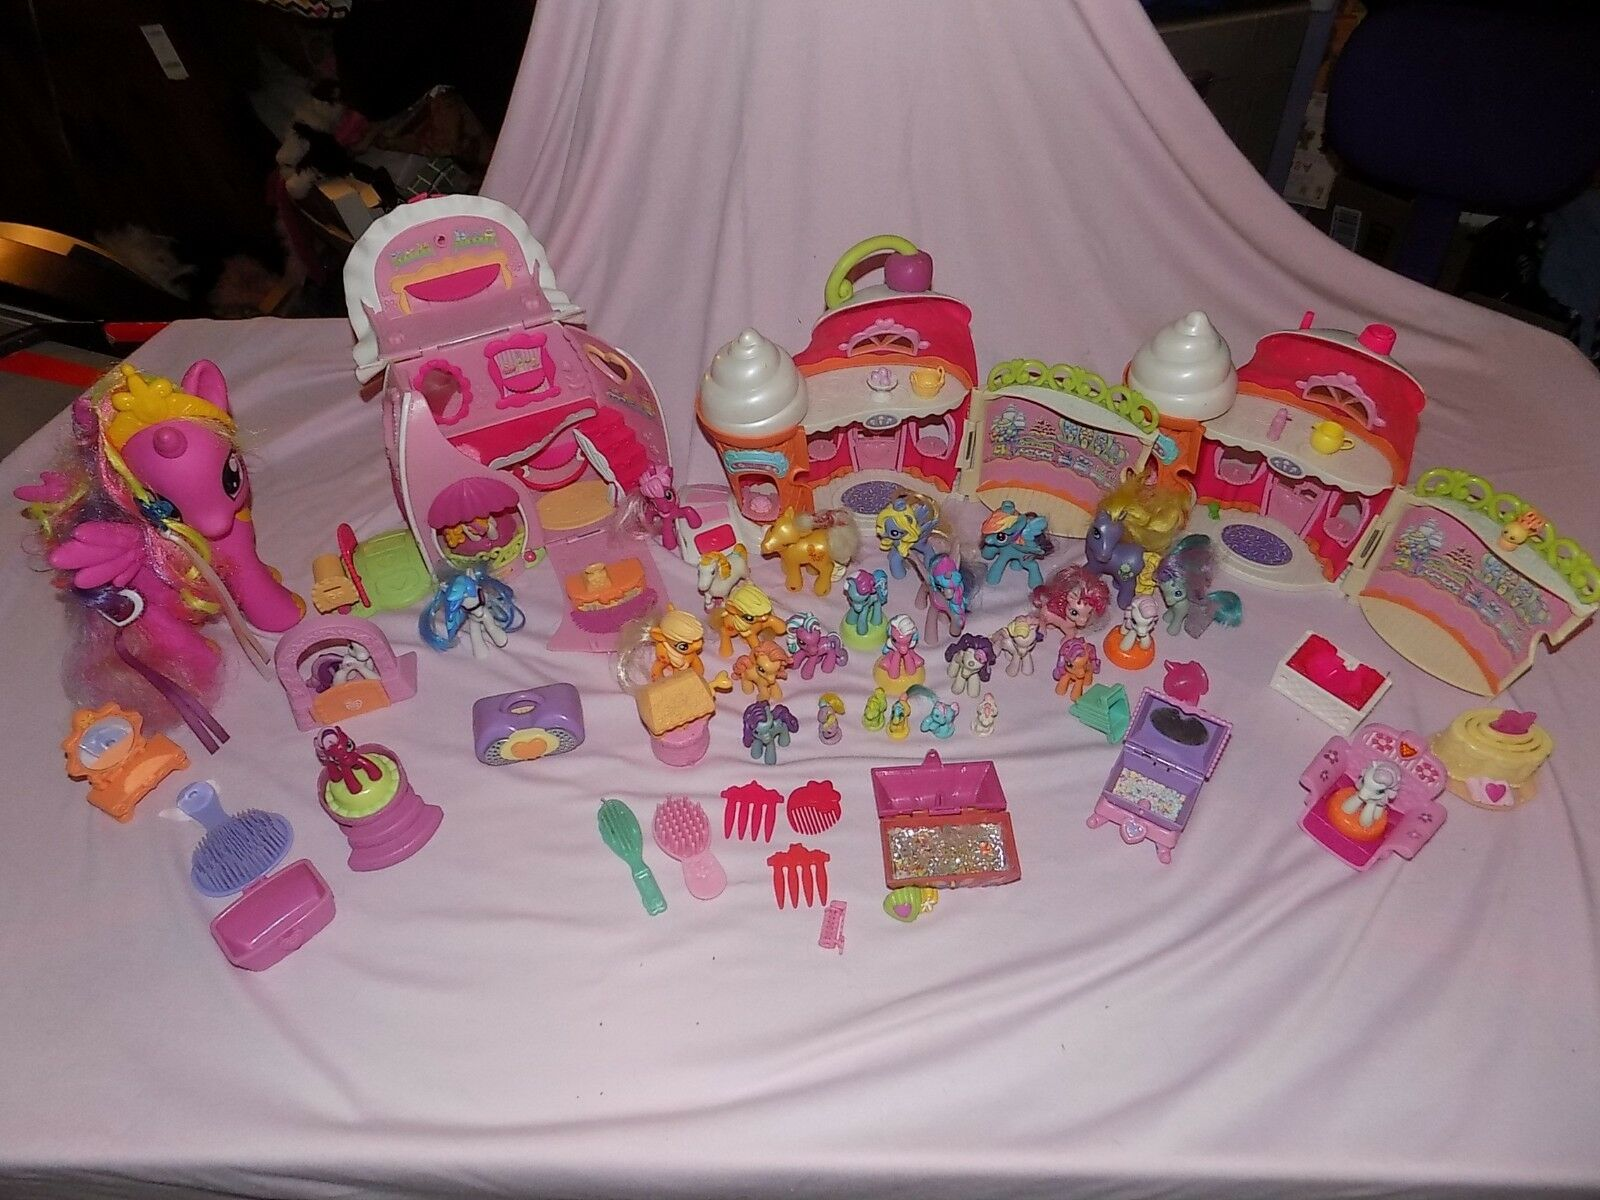 My Little Pony Large Lot of 32 Ponies, 3 Shop Buildings, 19 Accessories  LQQK